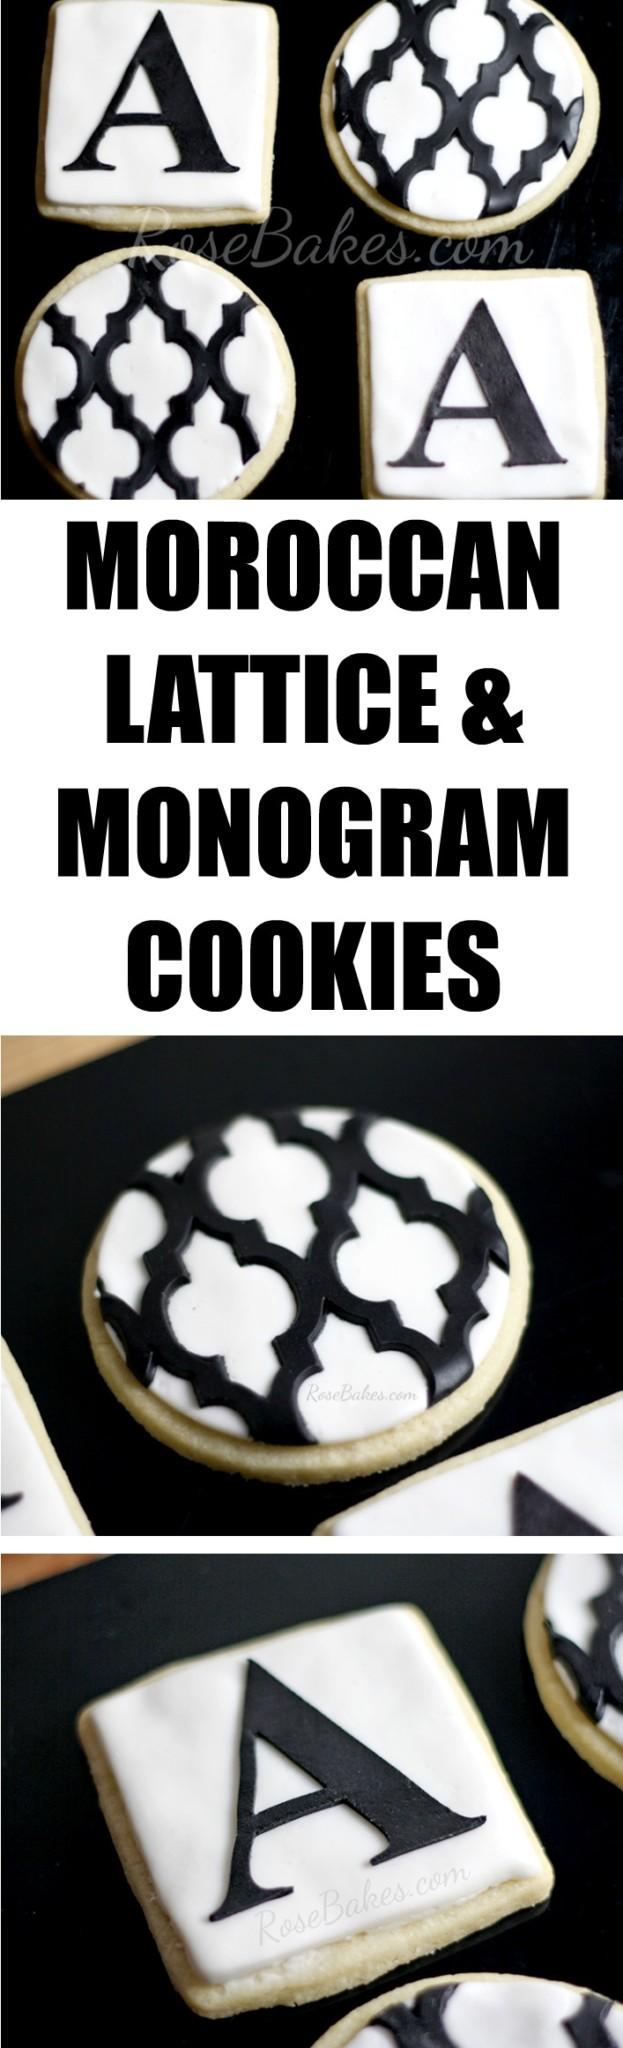 Moroccan Lattice & Monogram Cookies